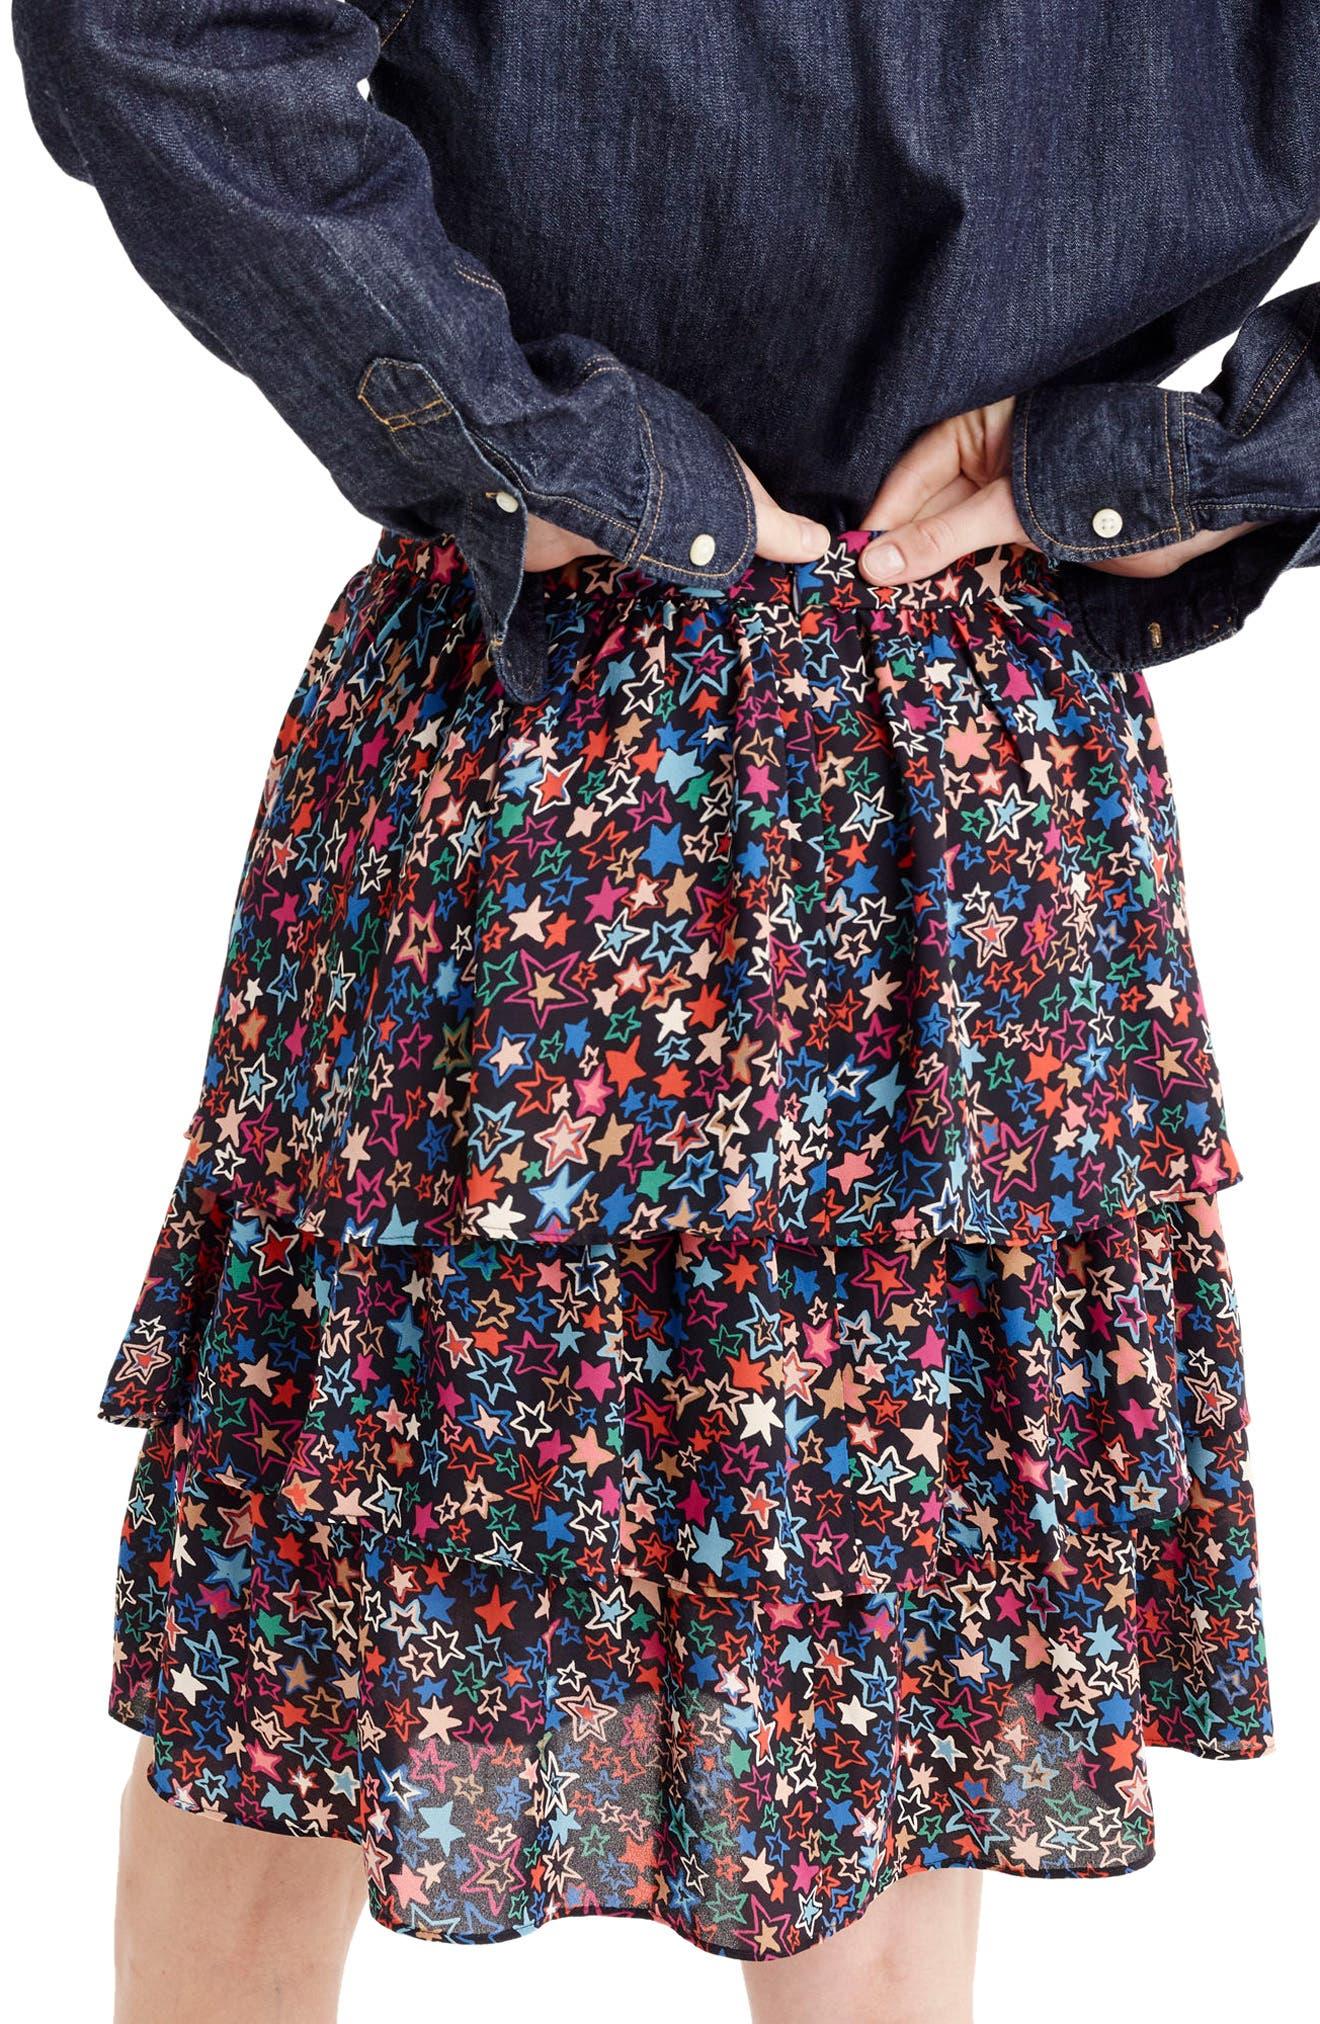 J.CREW,                             Star Print Tiered Skirt,                             Alternate thumbnail 2, color,                             409